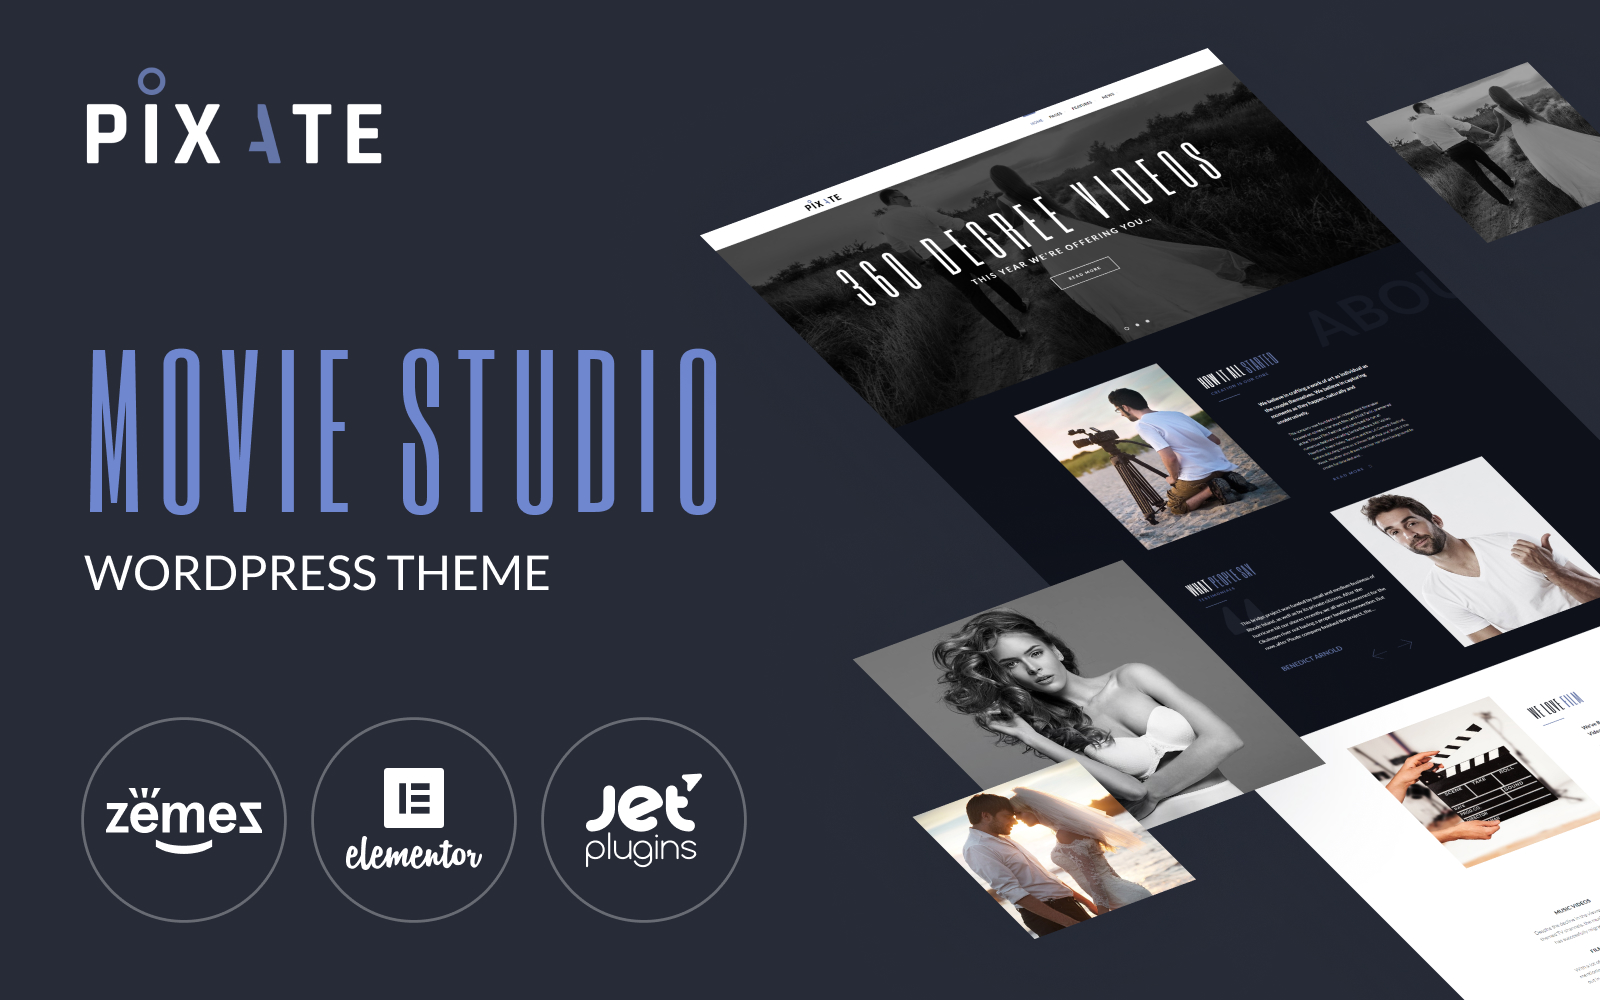 Pixate - Movie Studio WordPress Theme №65159